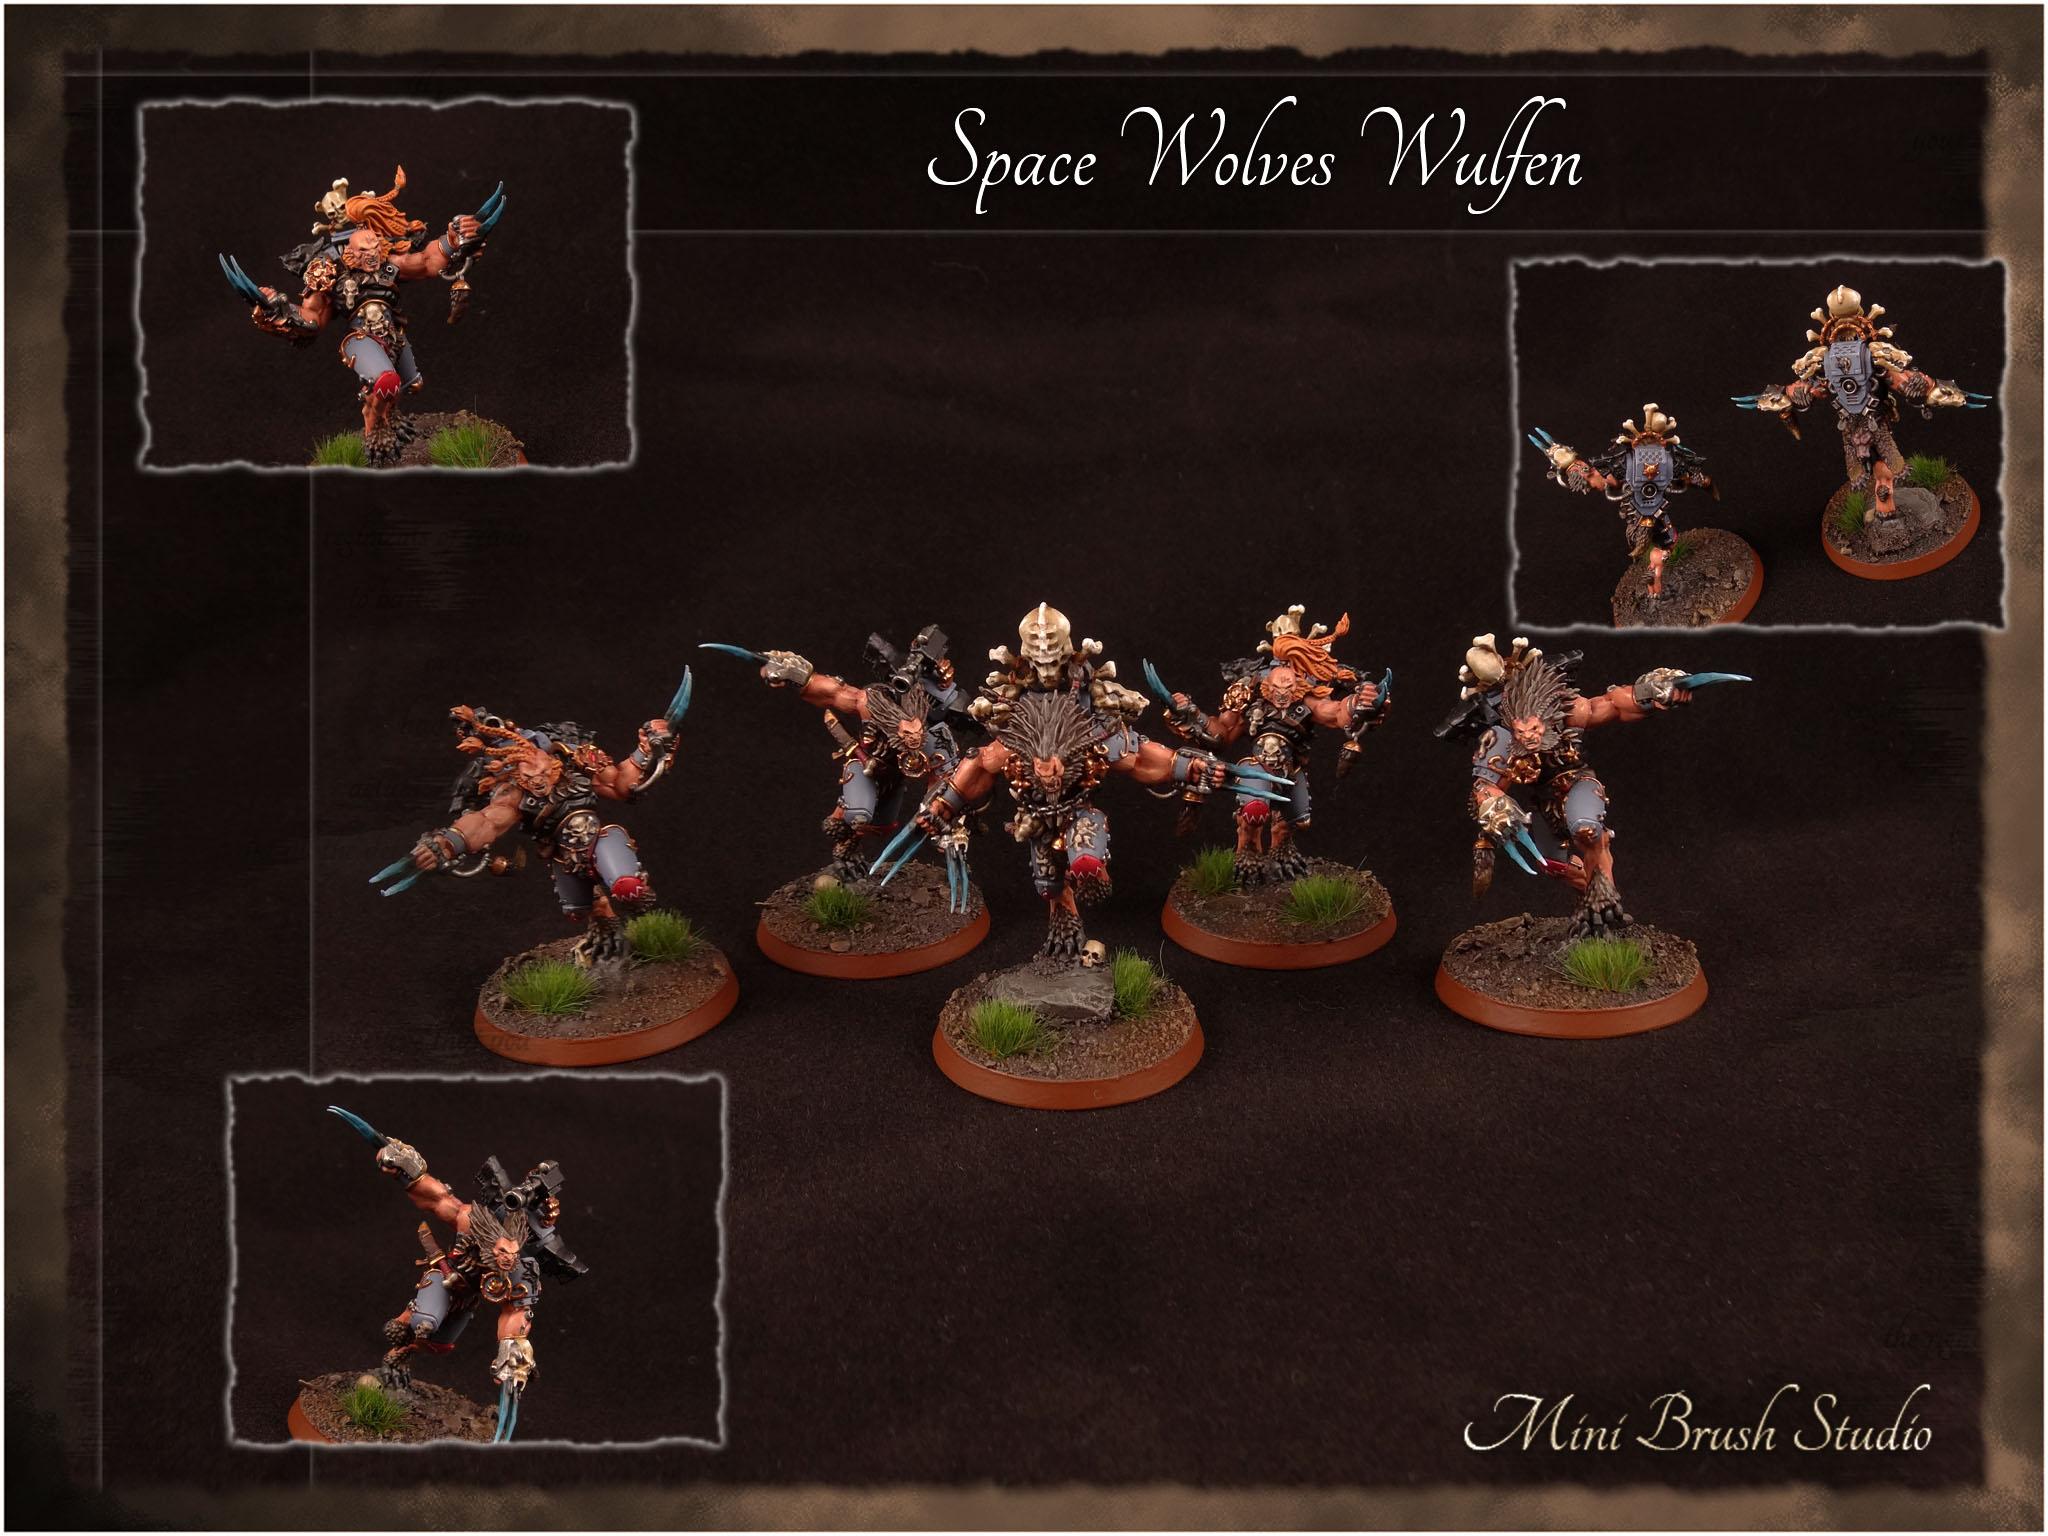 Space Wolves Wulfen 3 v7.jpg